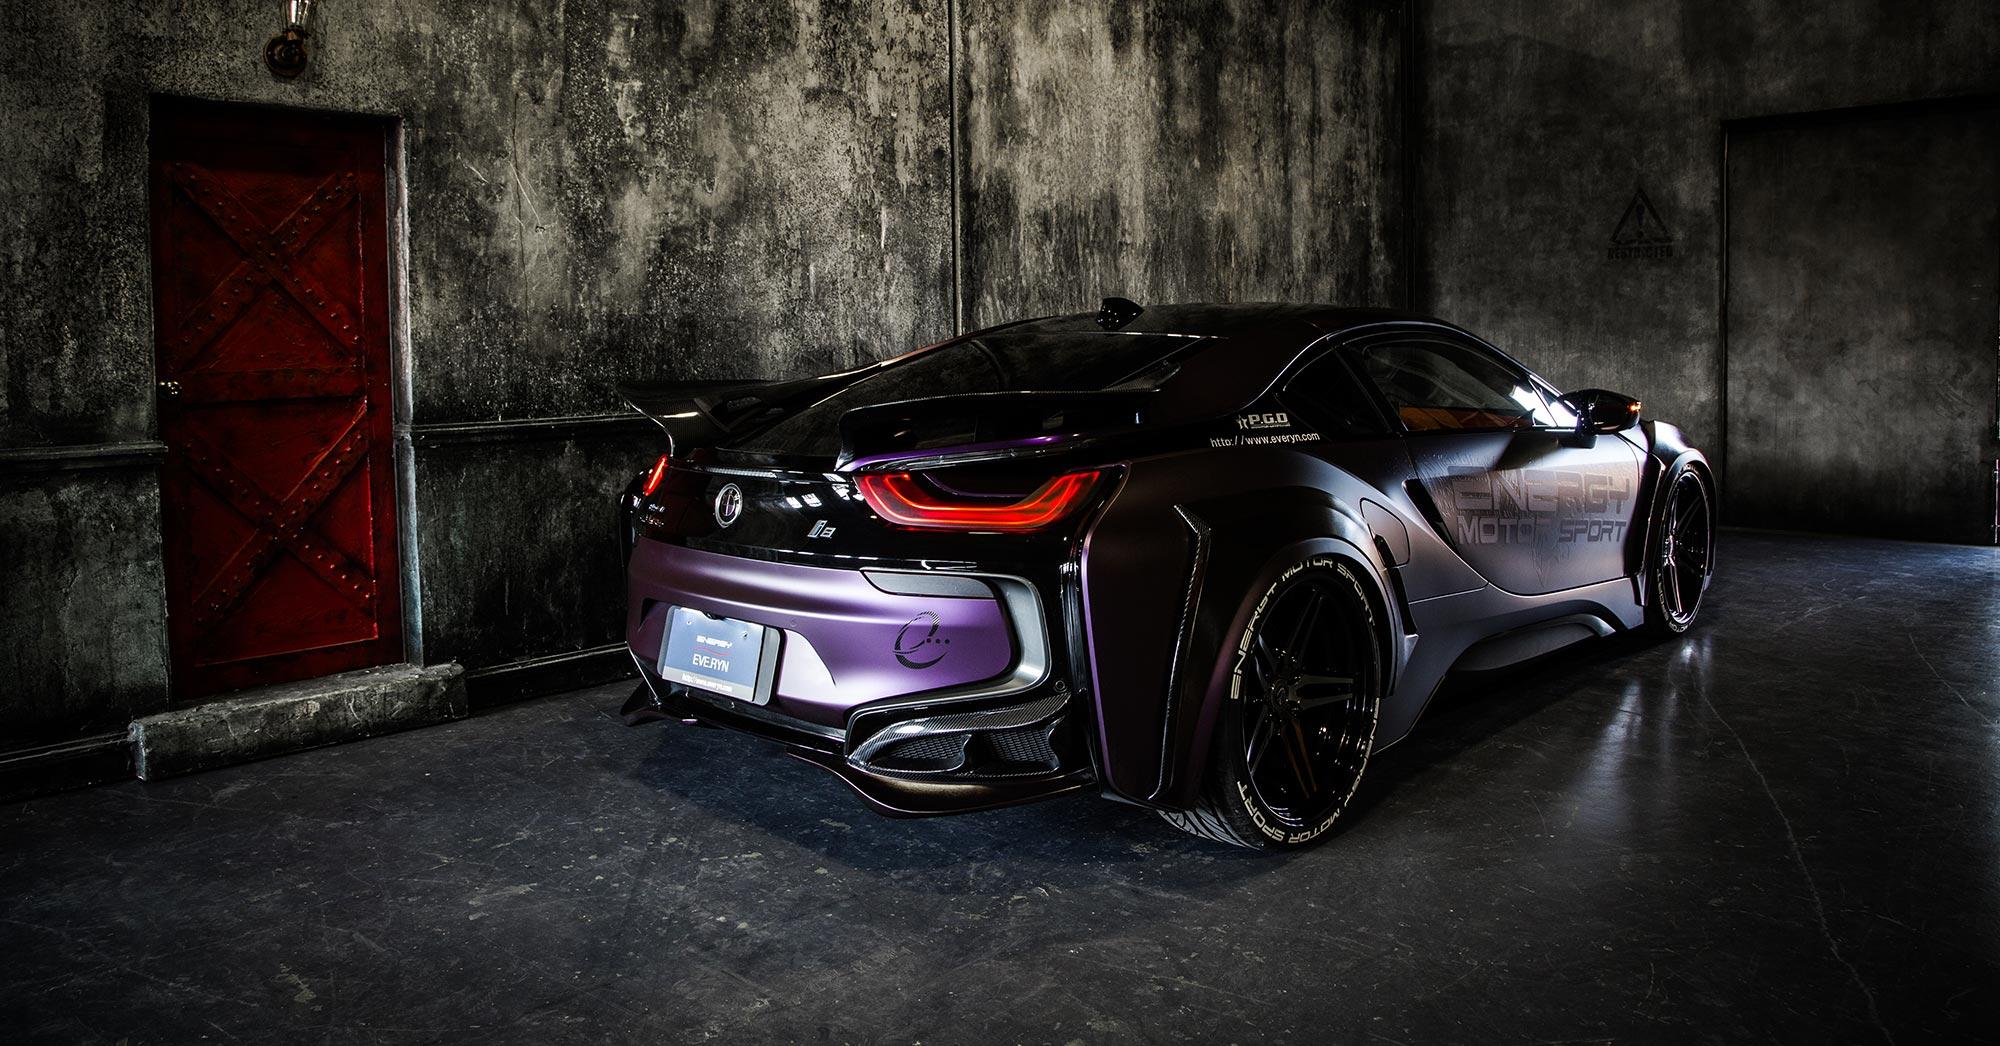 Energy Motorsport - BMW i8 Dark Knight Edition - 2017 - rear